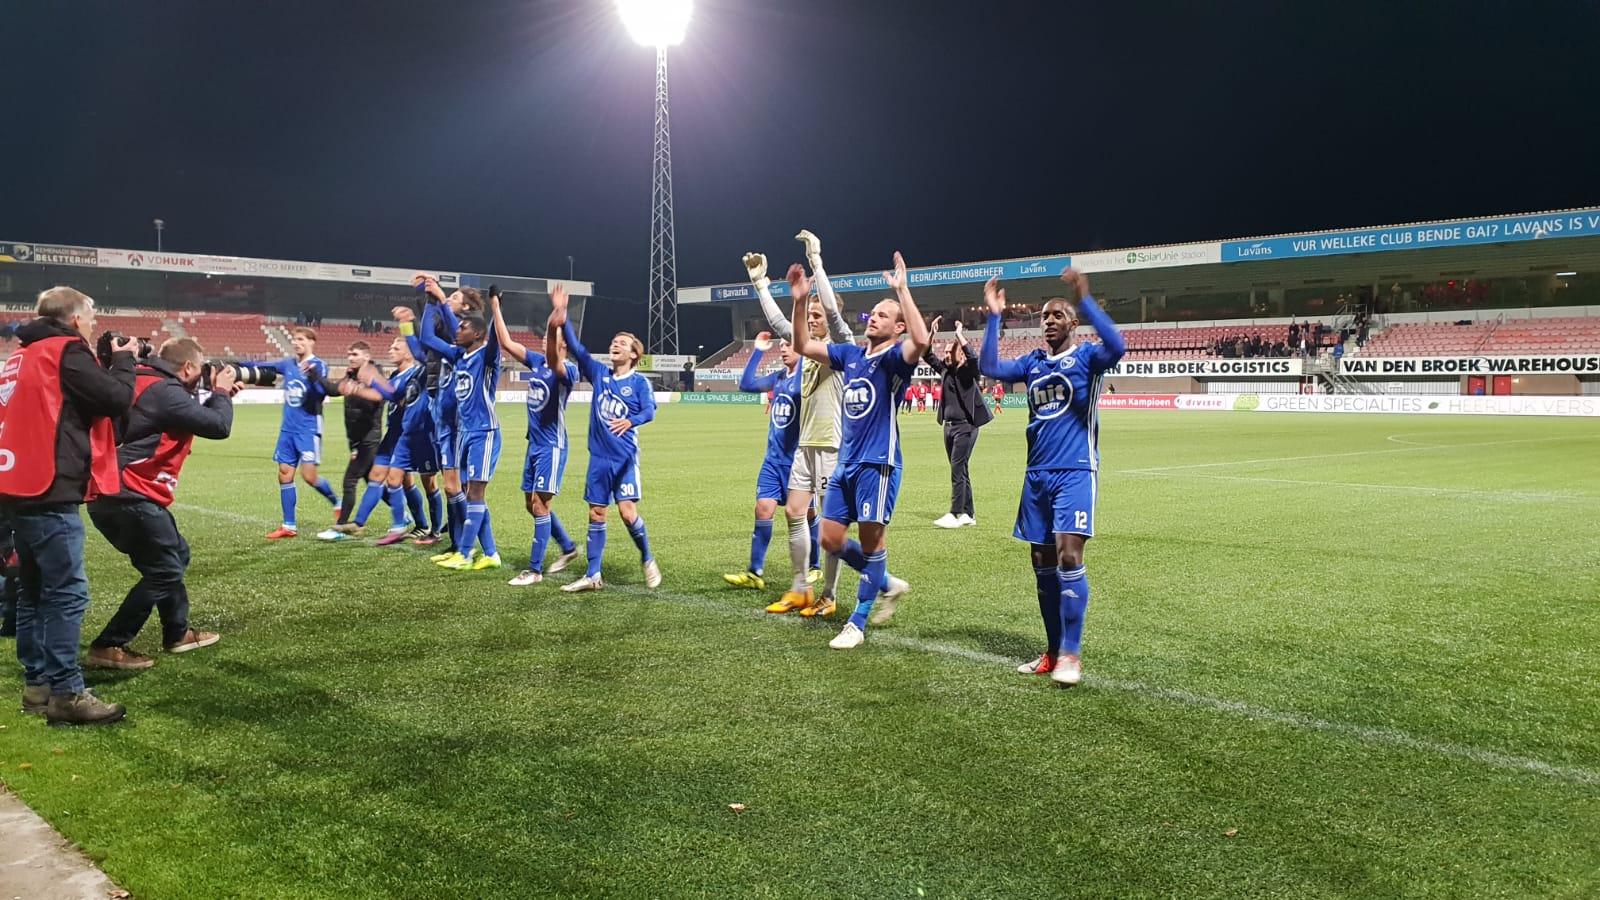 Keuken Kampioen Almere : Almere city fc pakt belangrijke punten in helmond almere city fans